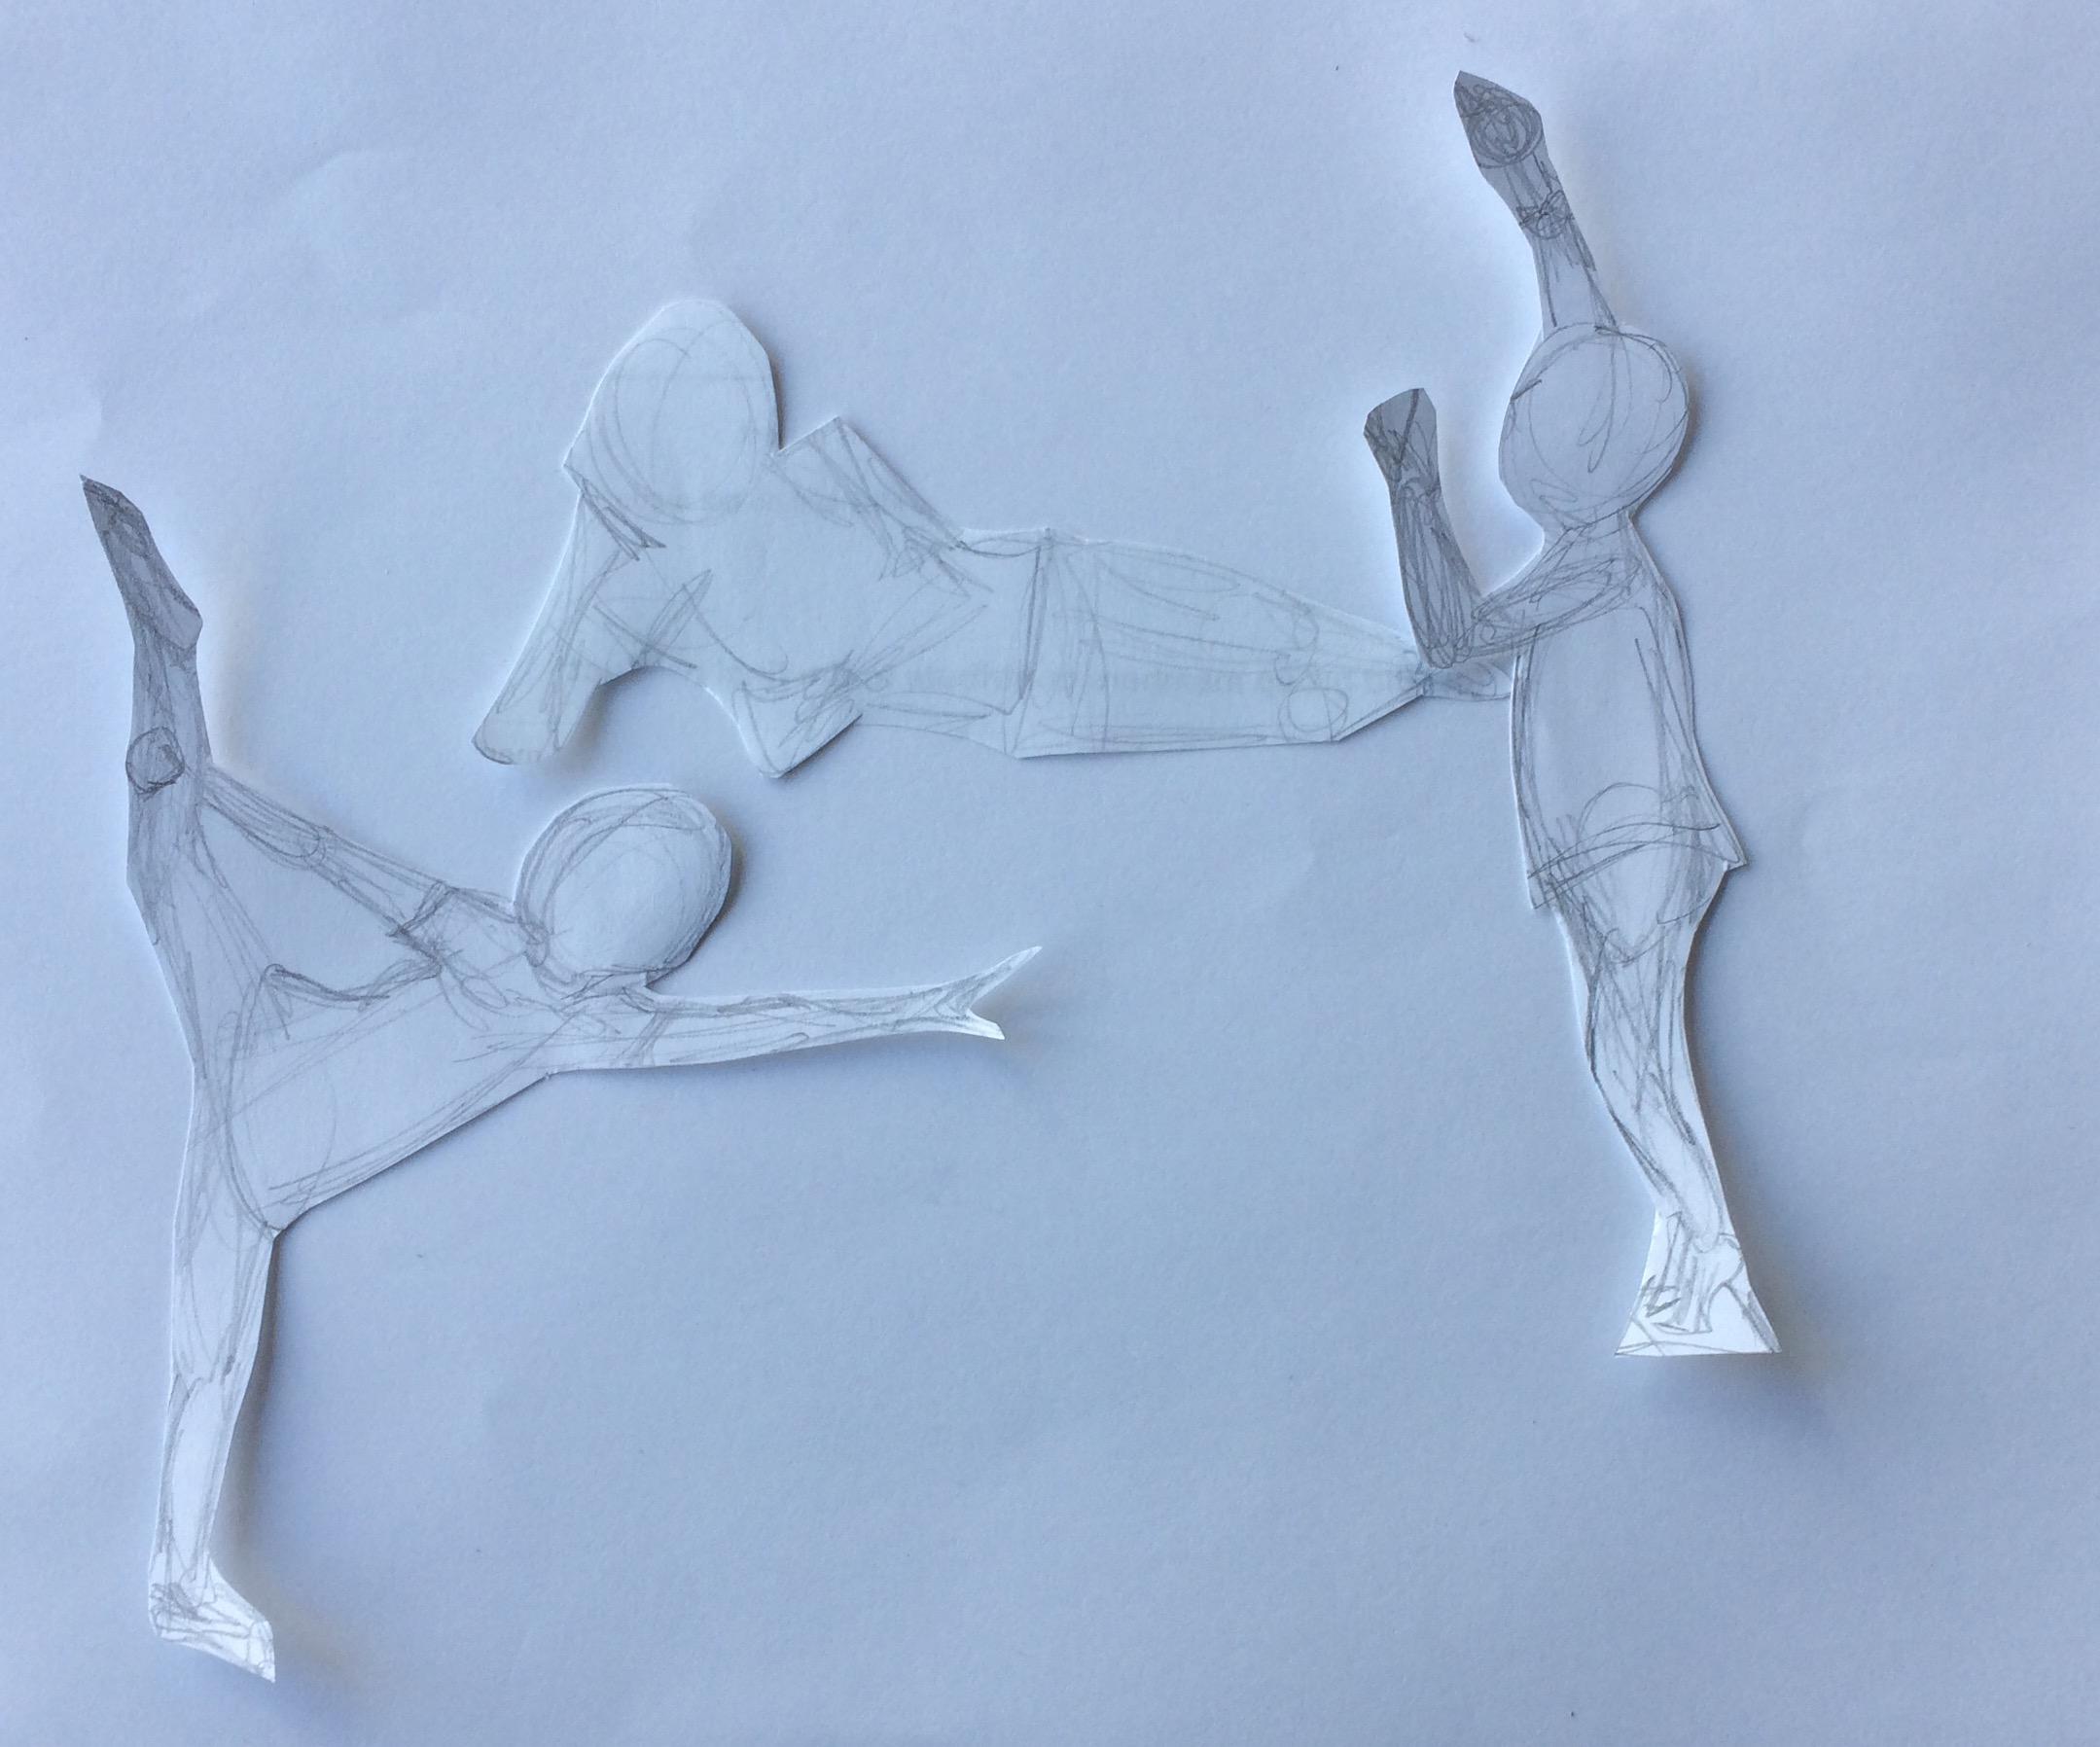 cutout figures